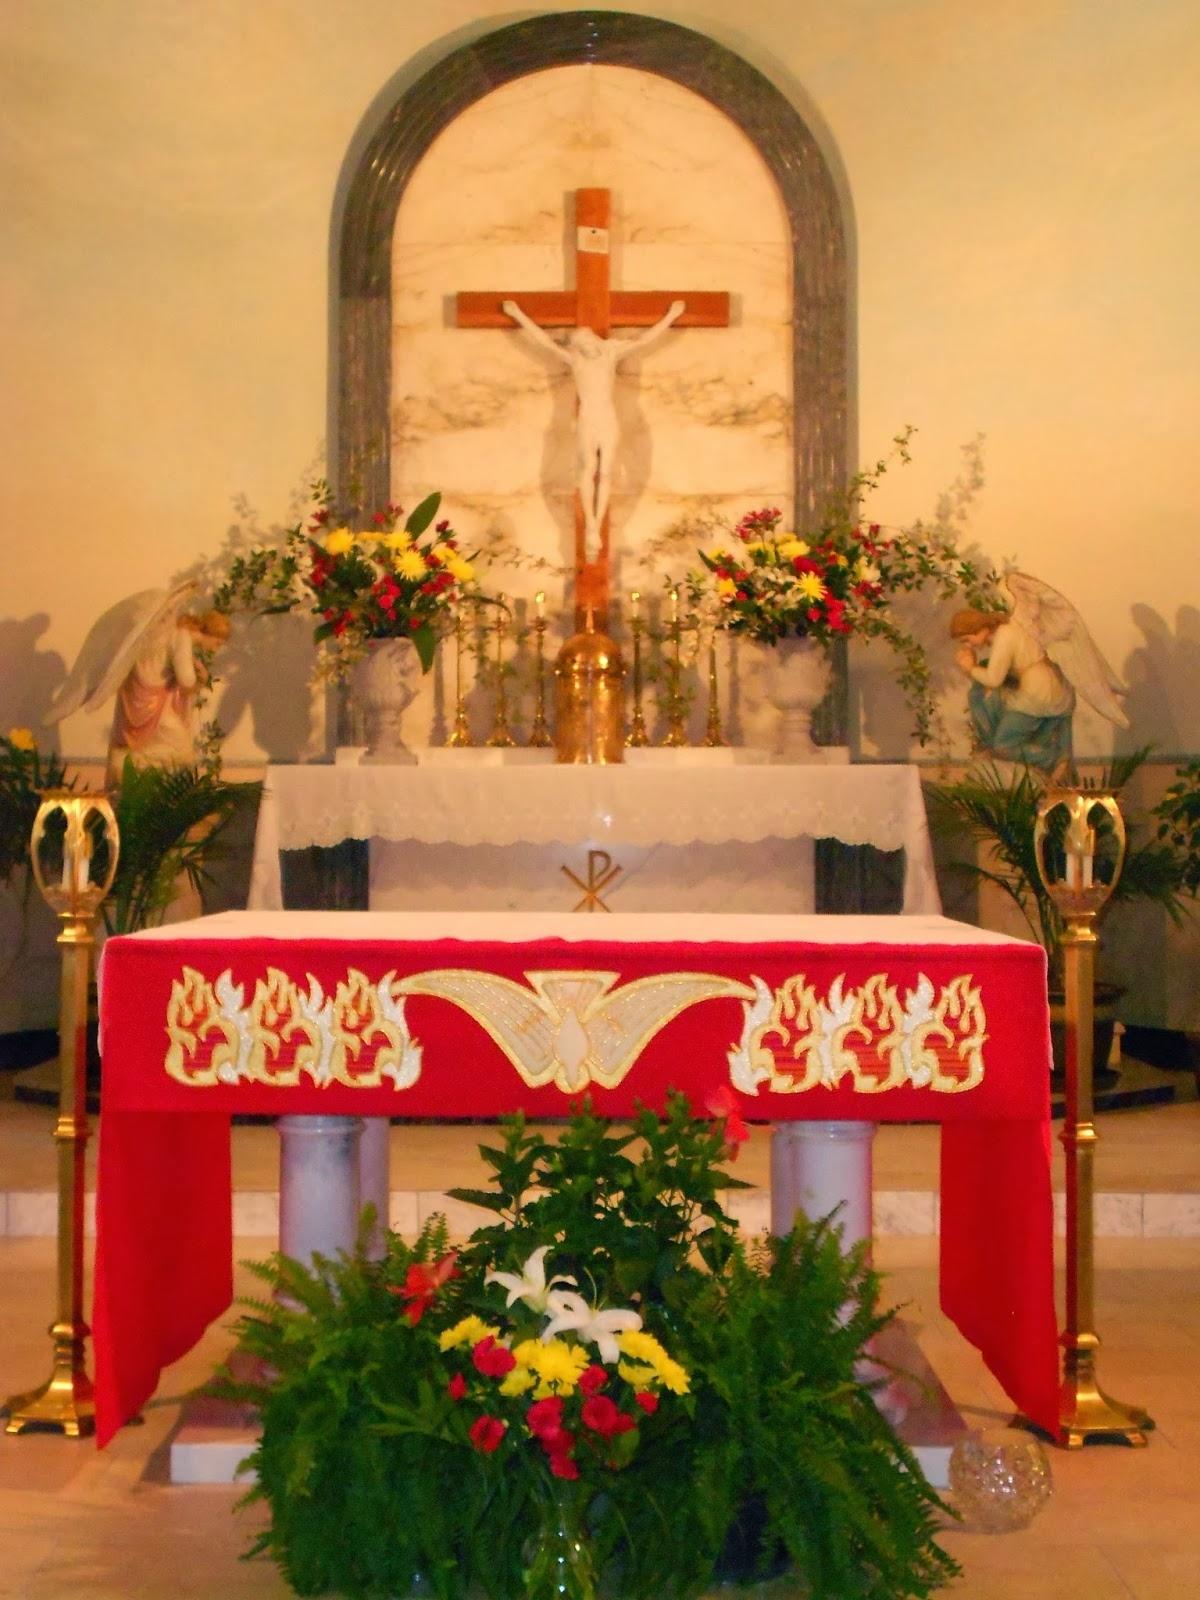 John Oliver Dowdle Interiors: Altar Flowers Part 1